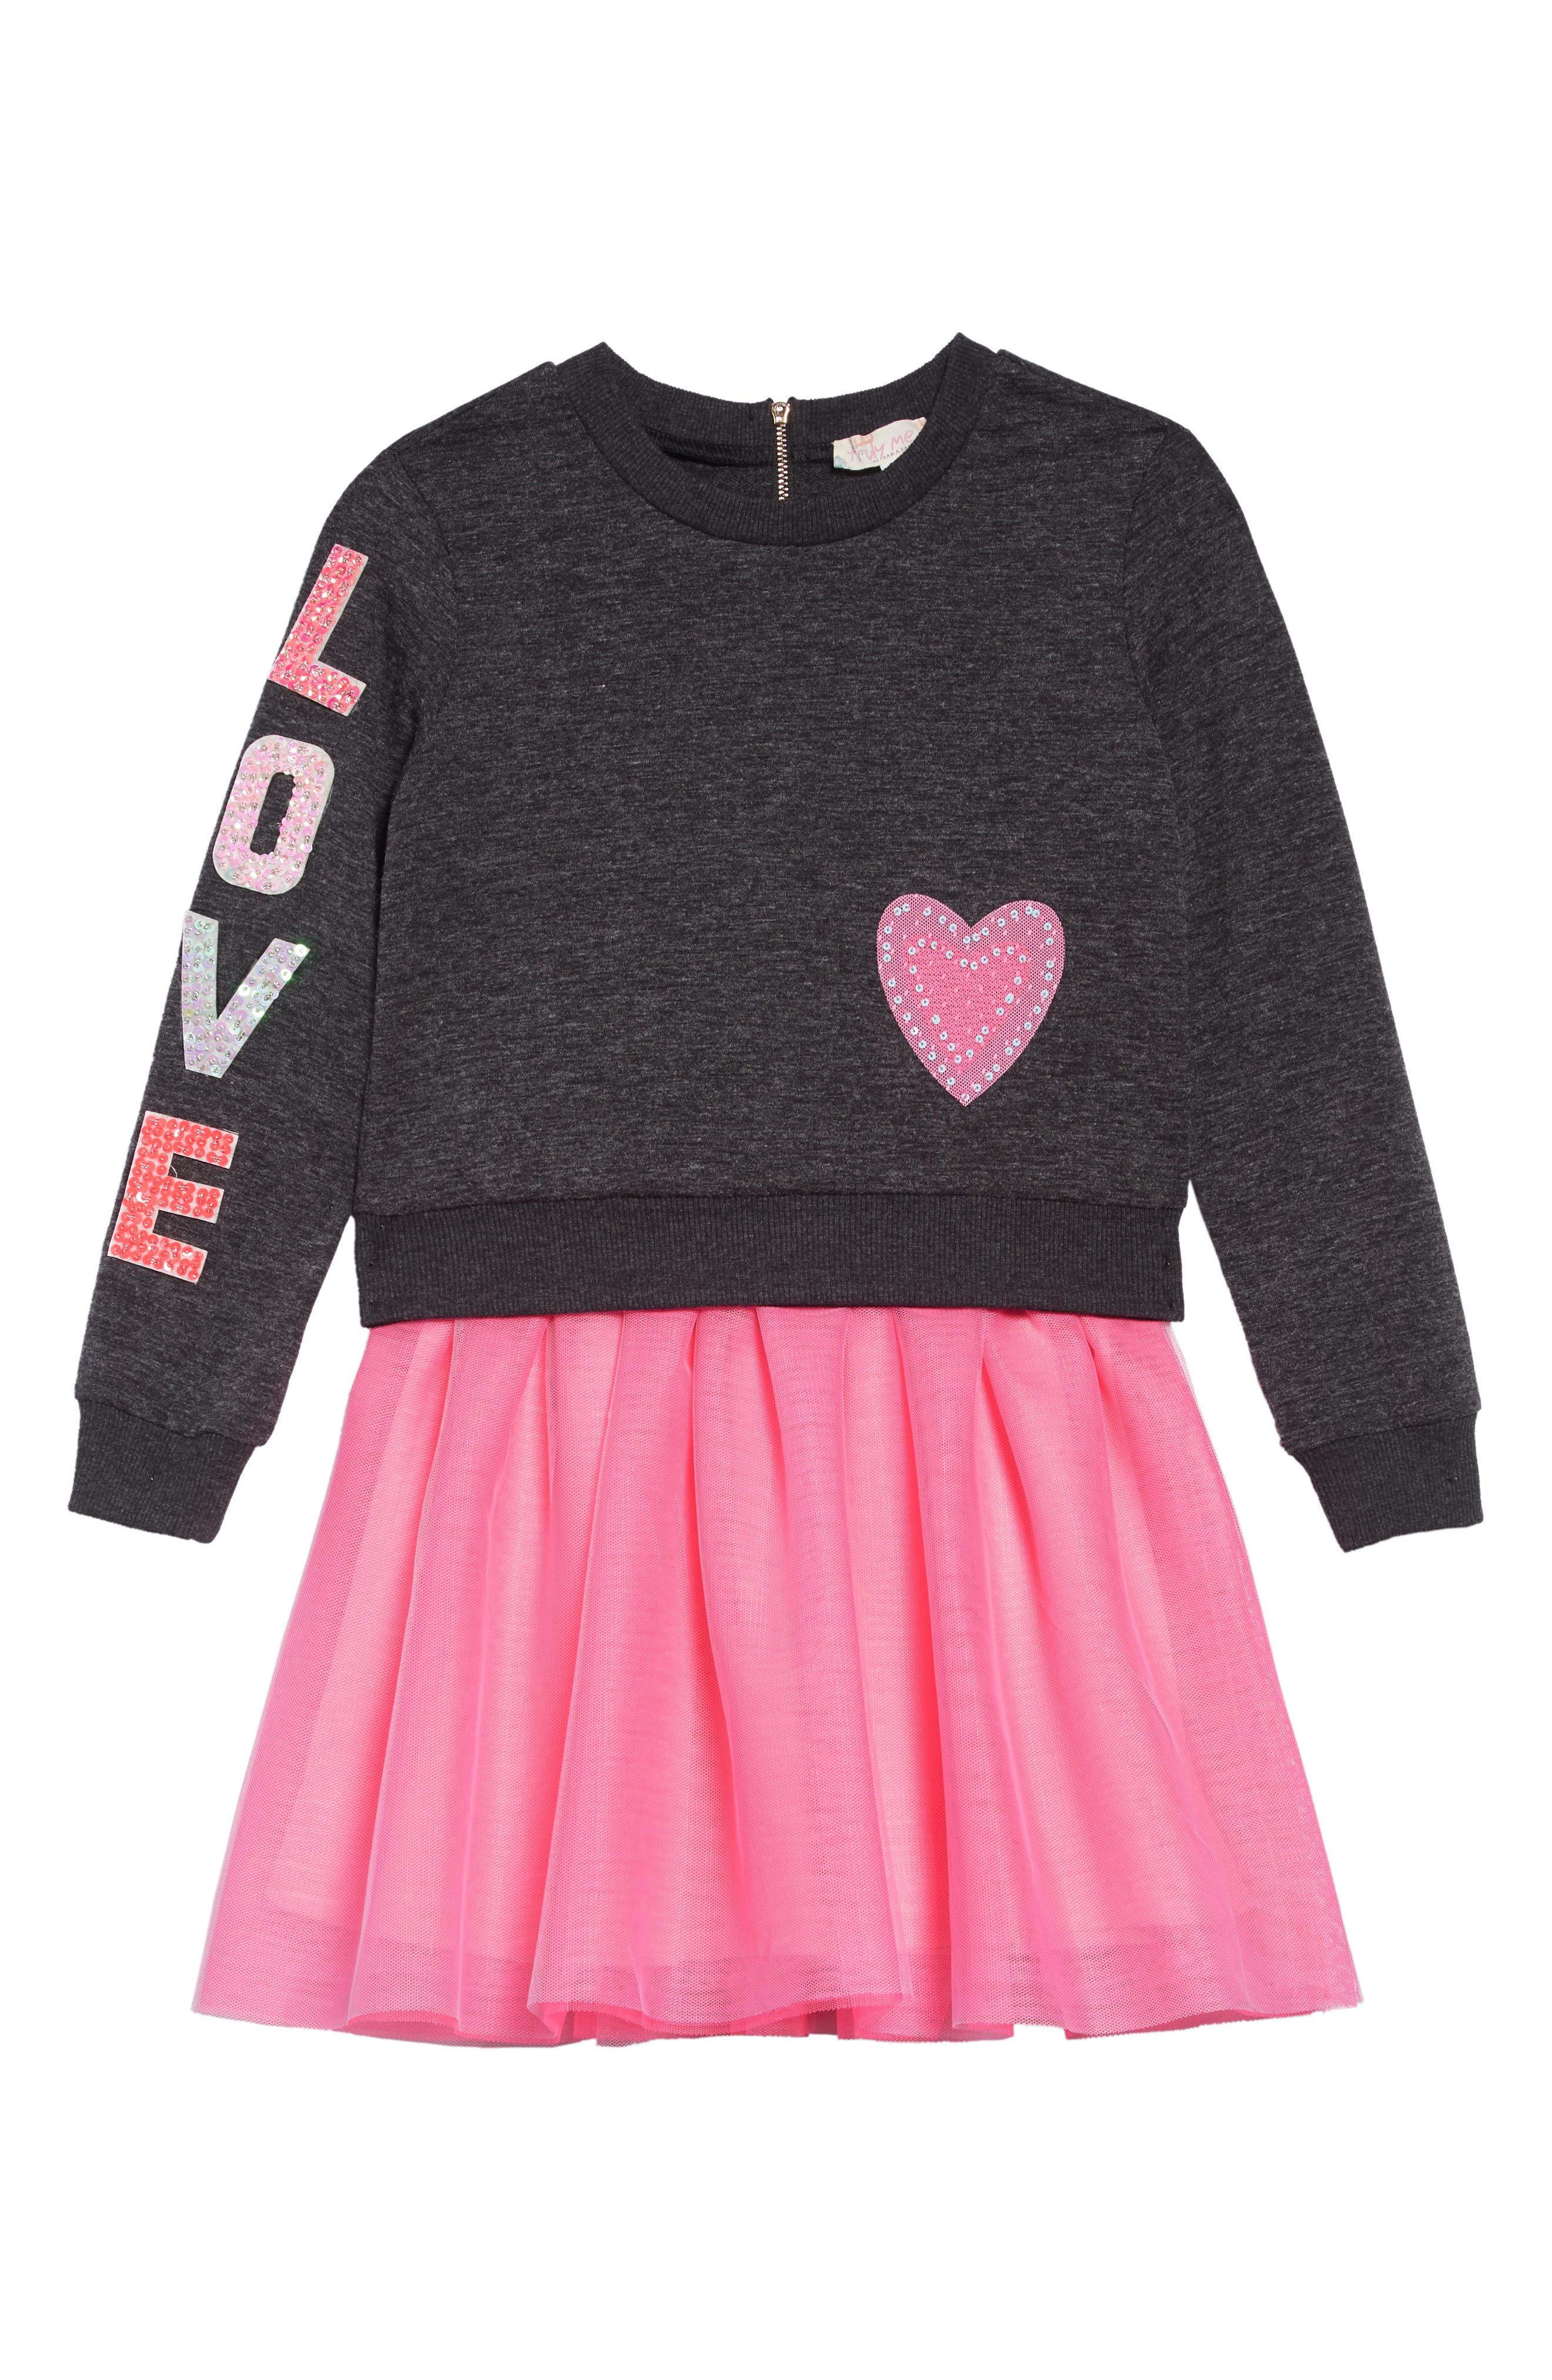 TRULY ME,                             Love Dress Set,                             Main thumbnail 1, color,                             GREY PINK